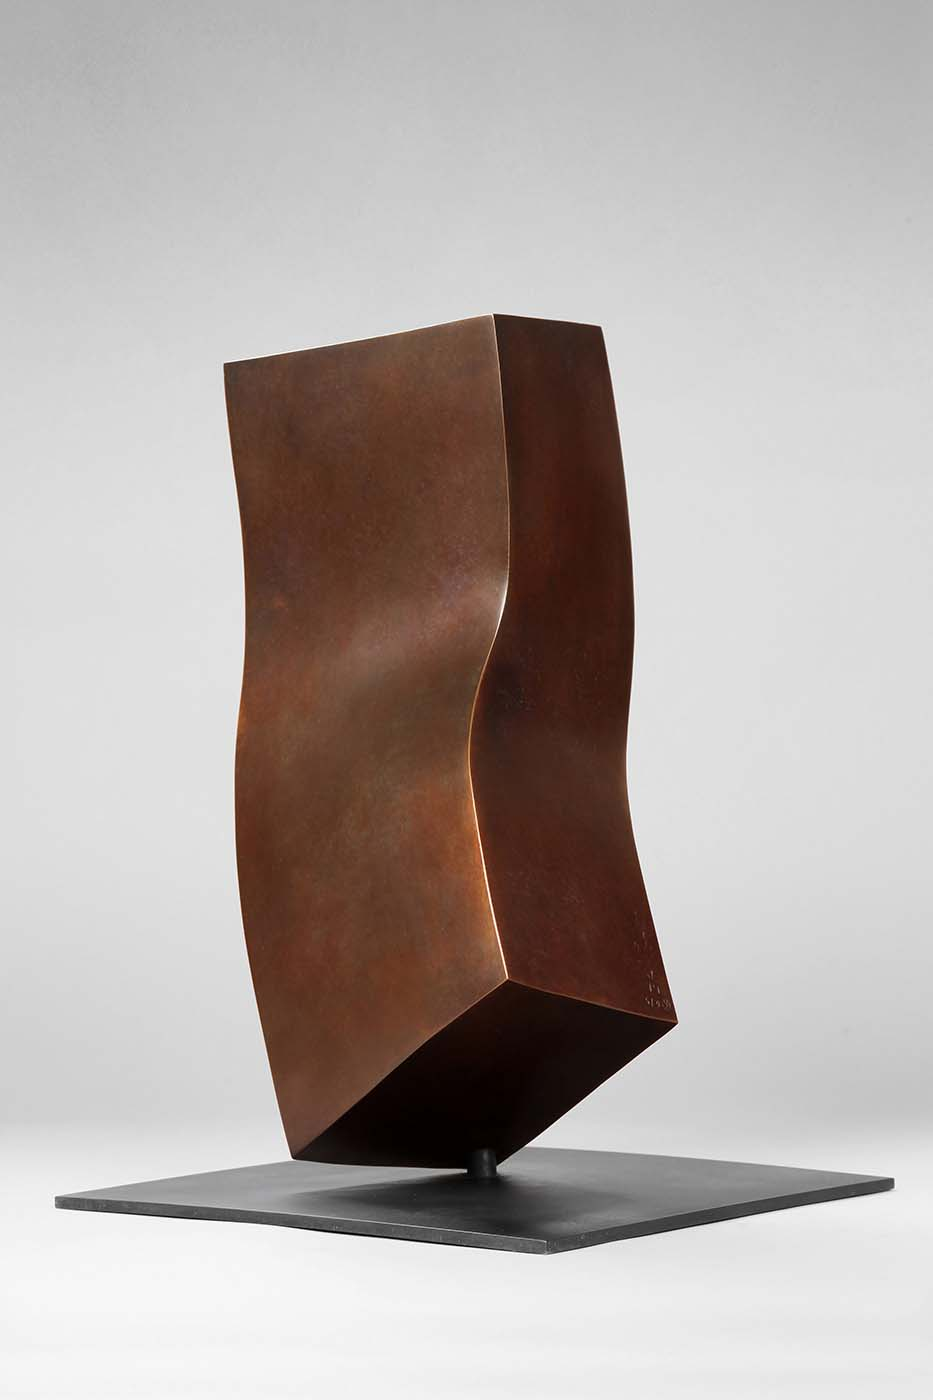 Anderer Gedanke, 2010, Bronze, 25 x 25 x 40 cm (01)